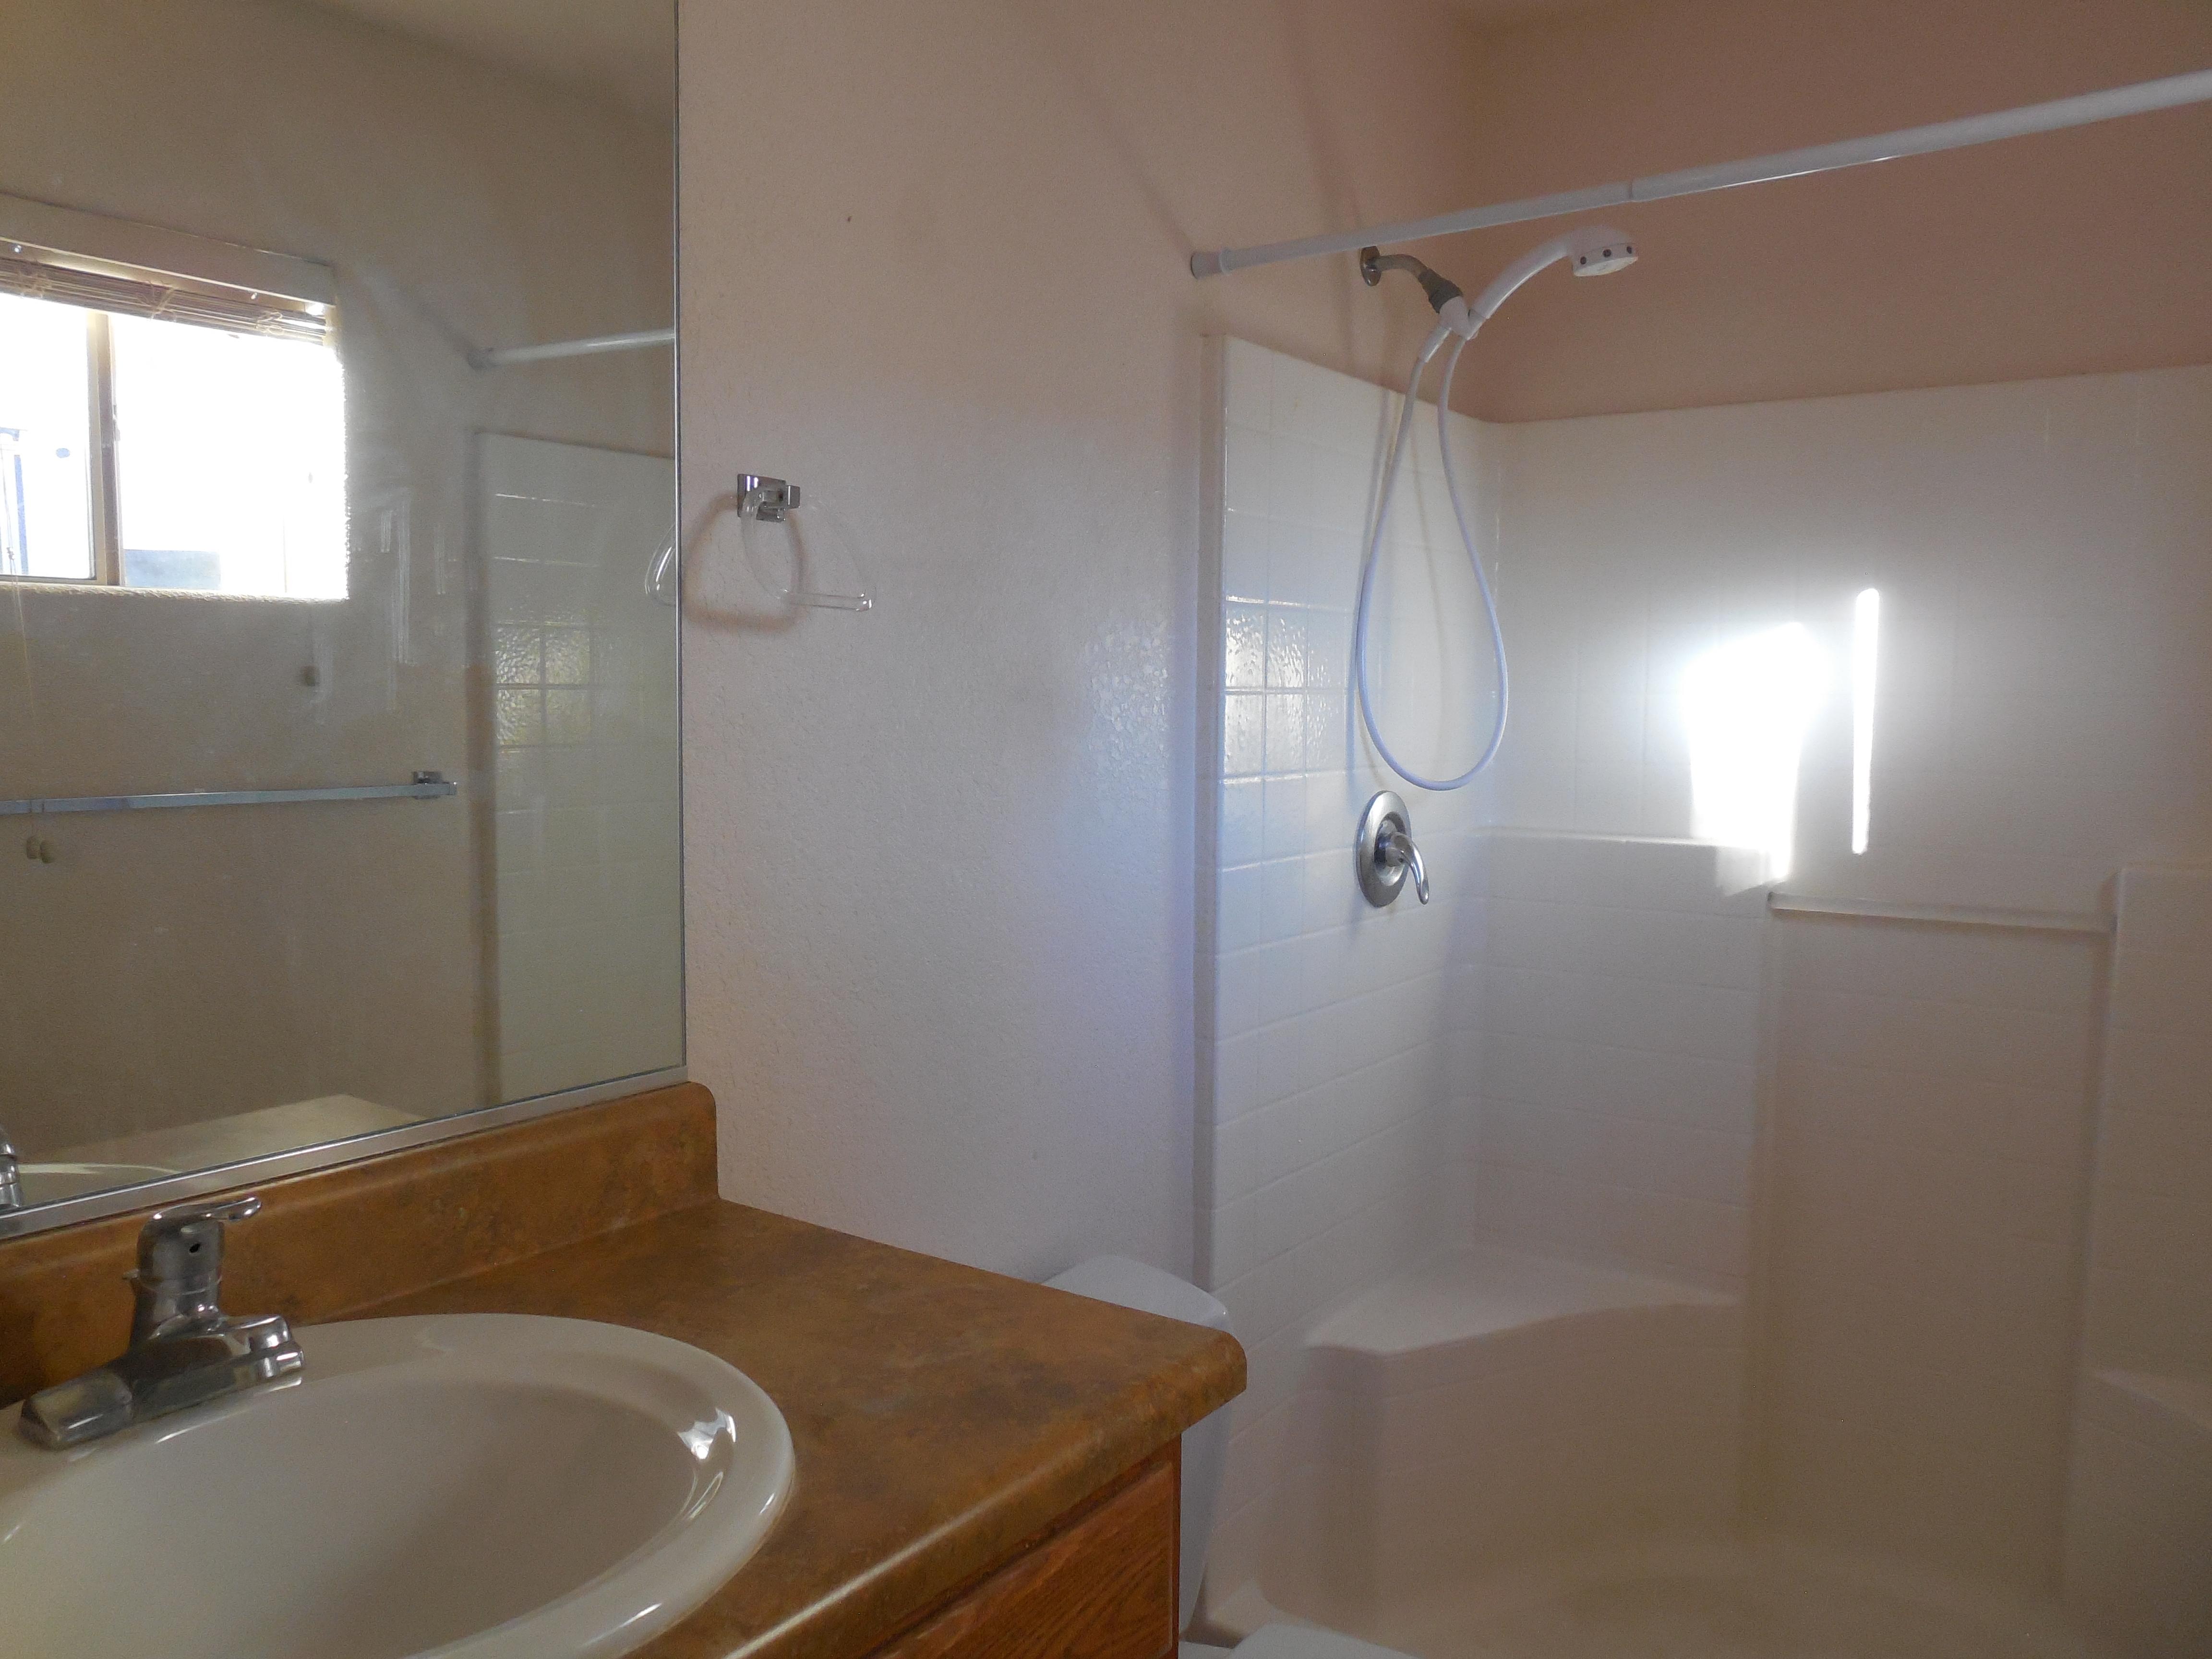 10388 bath